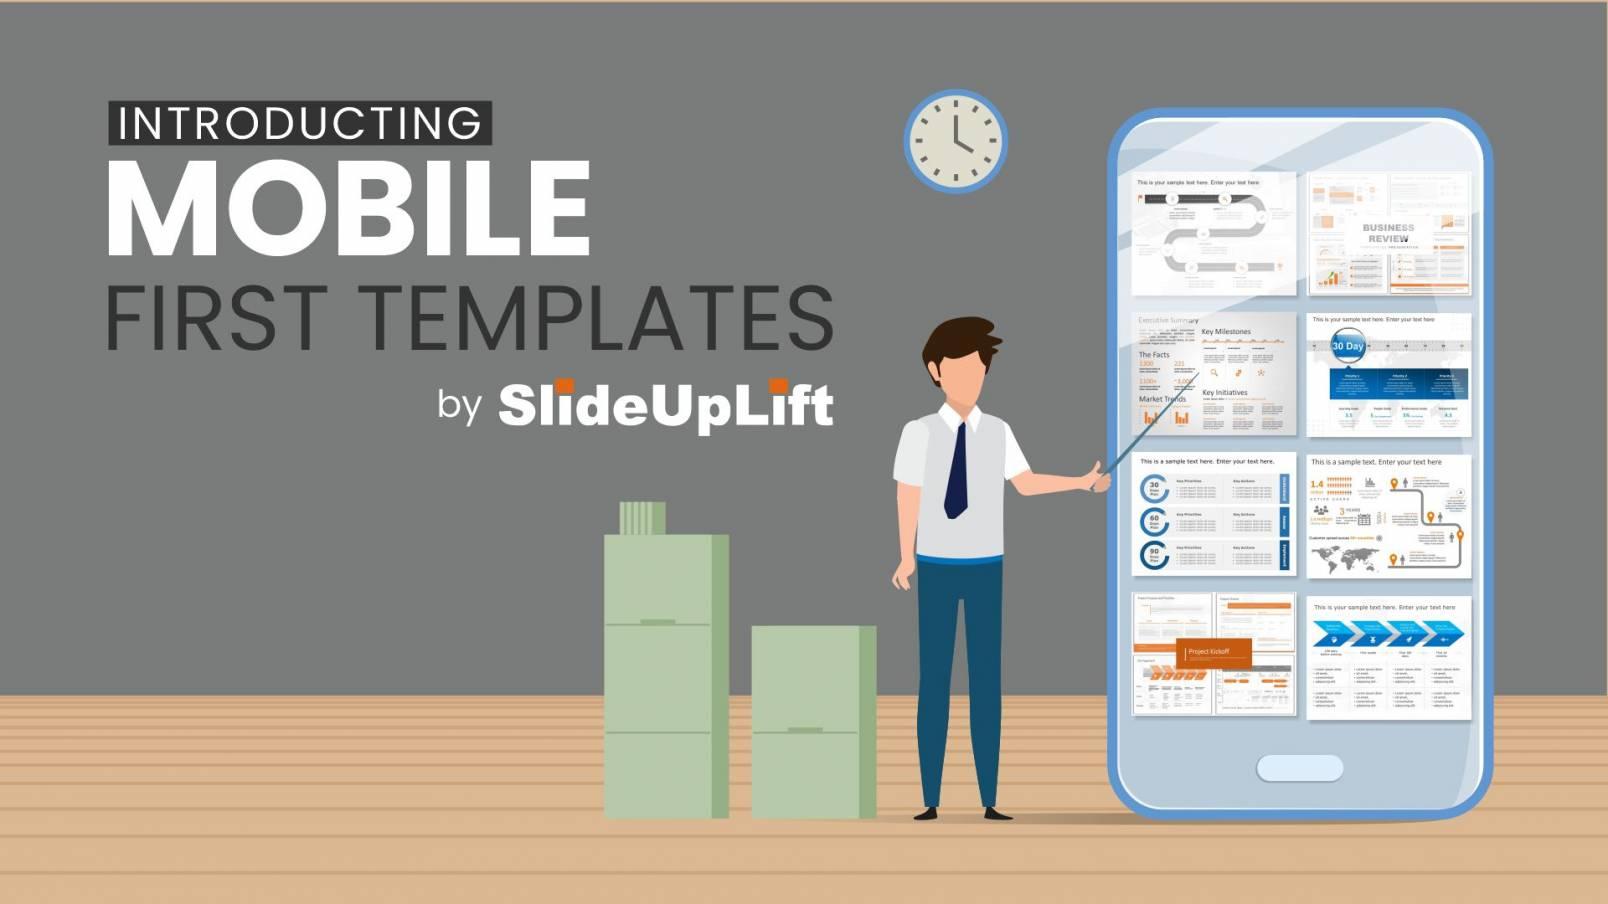 SlideUpLift's Mobile First PowerPoint Templates